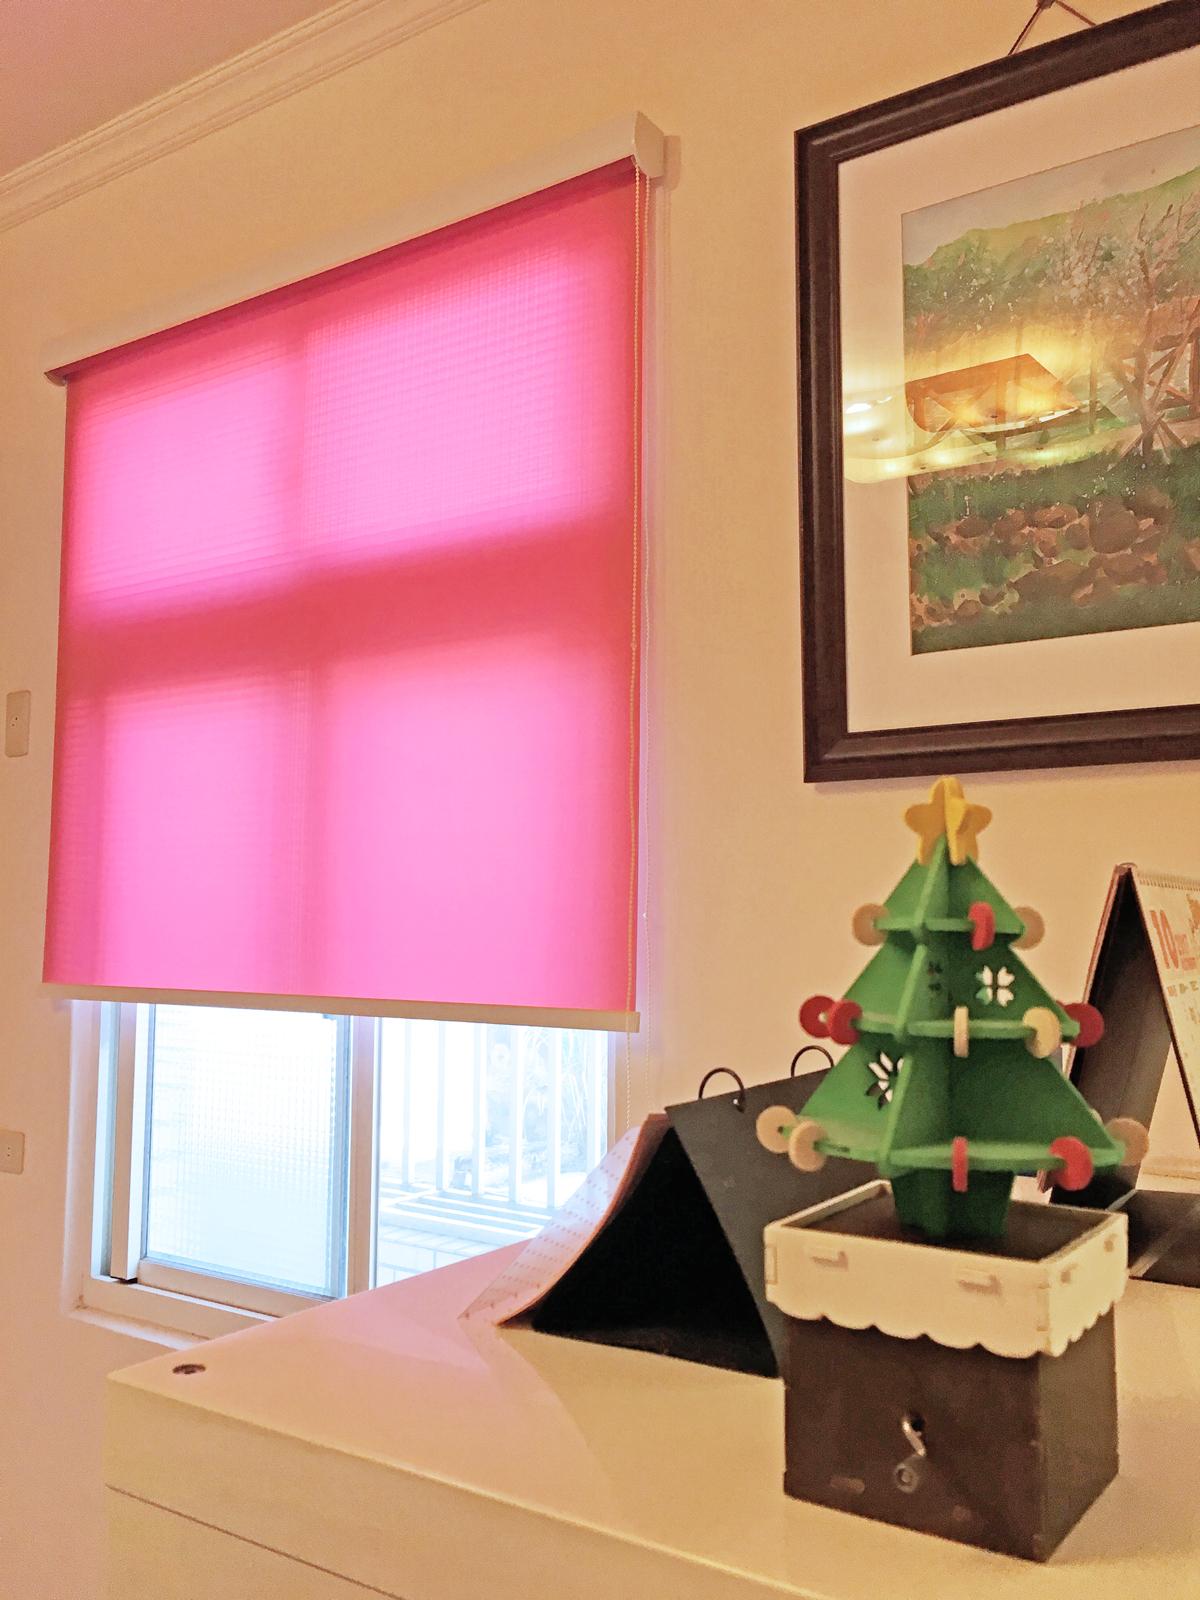 粉紅色窗簾 捲簾 Pink Roller Blinds